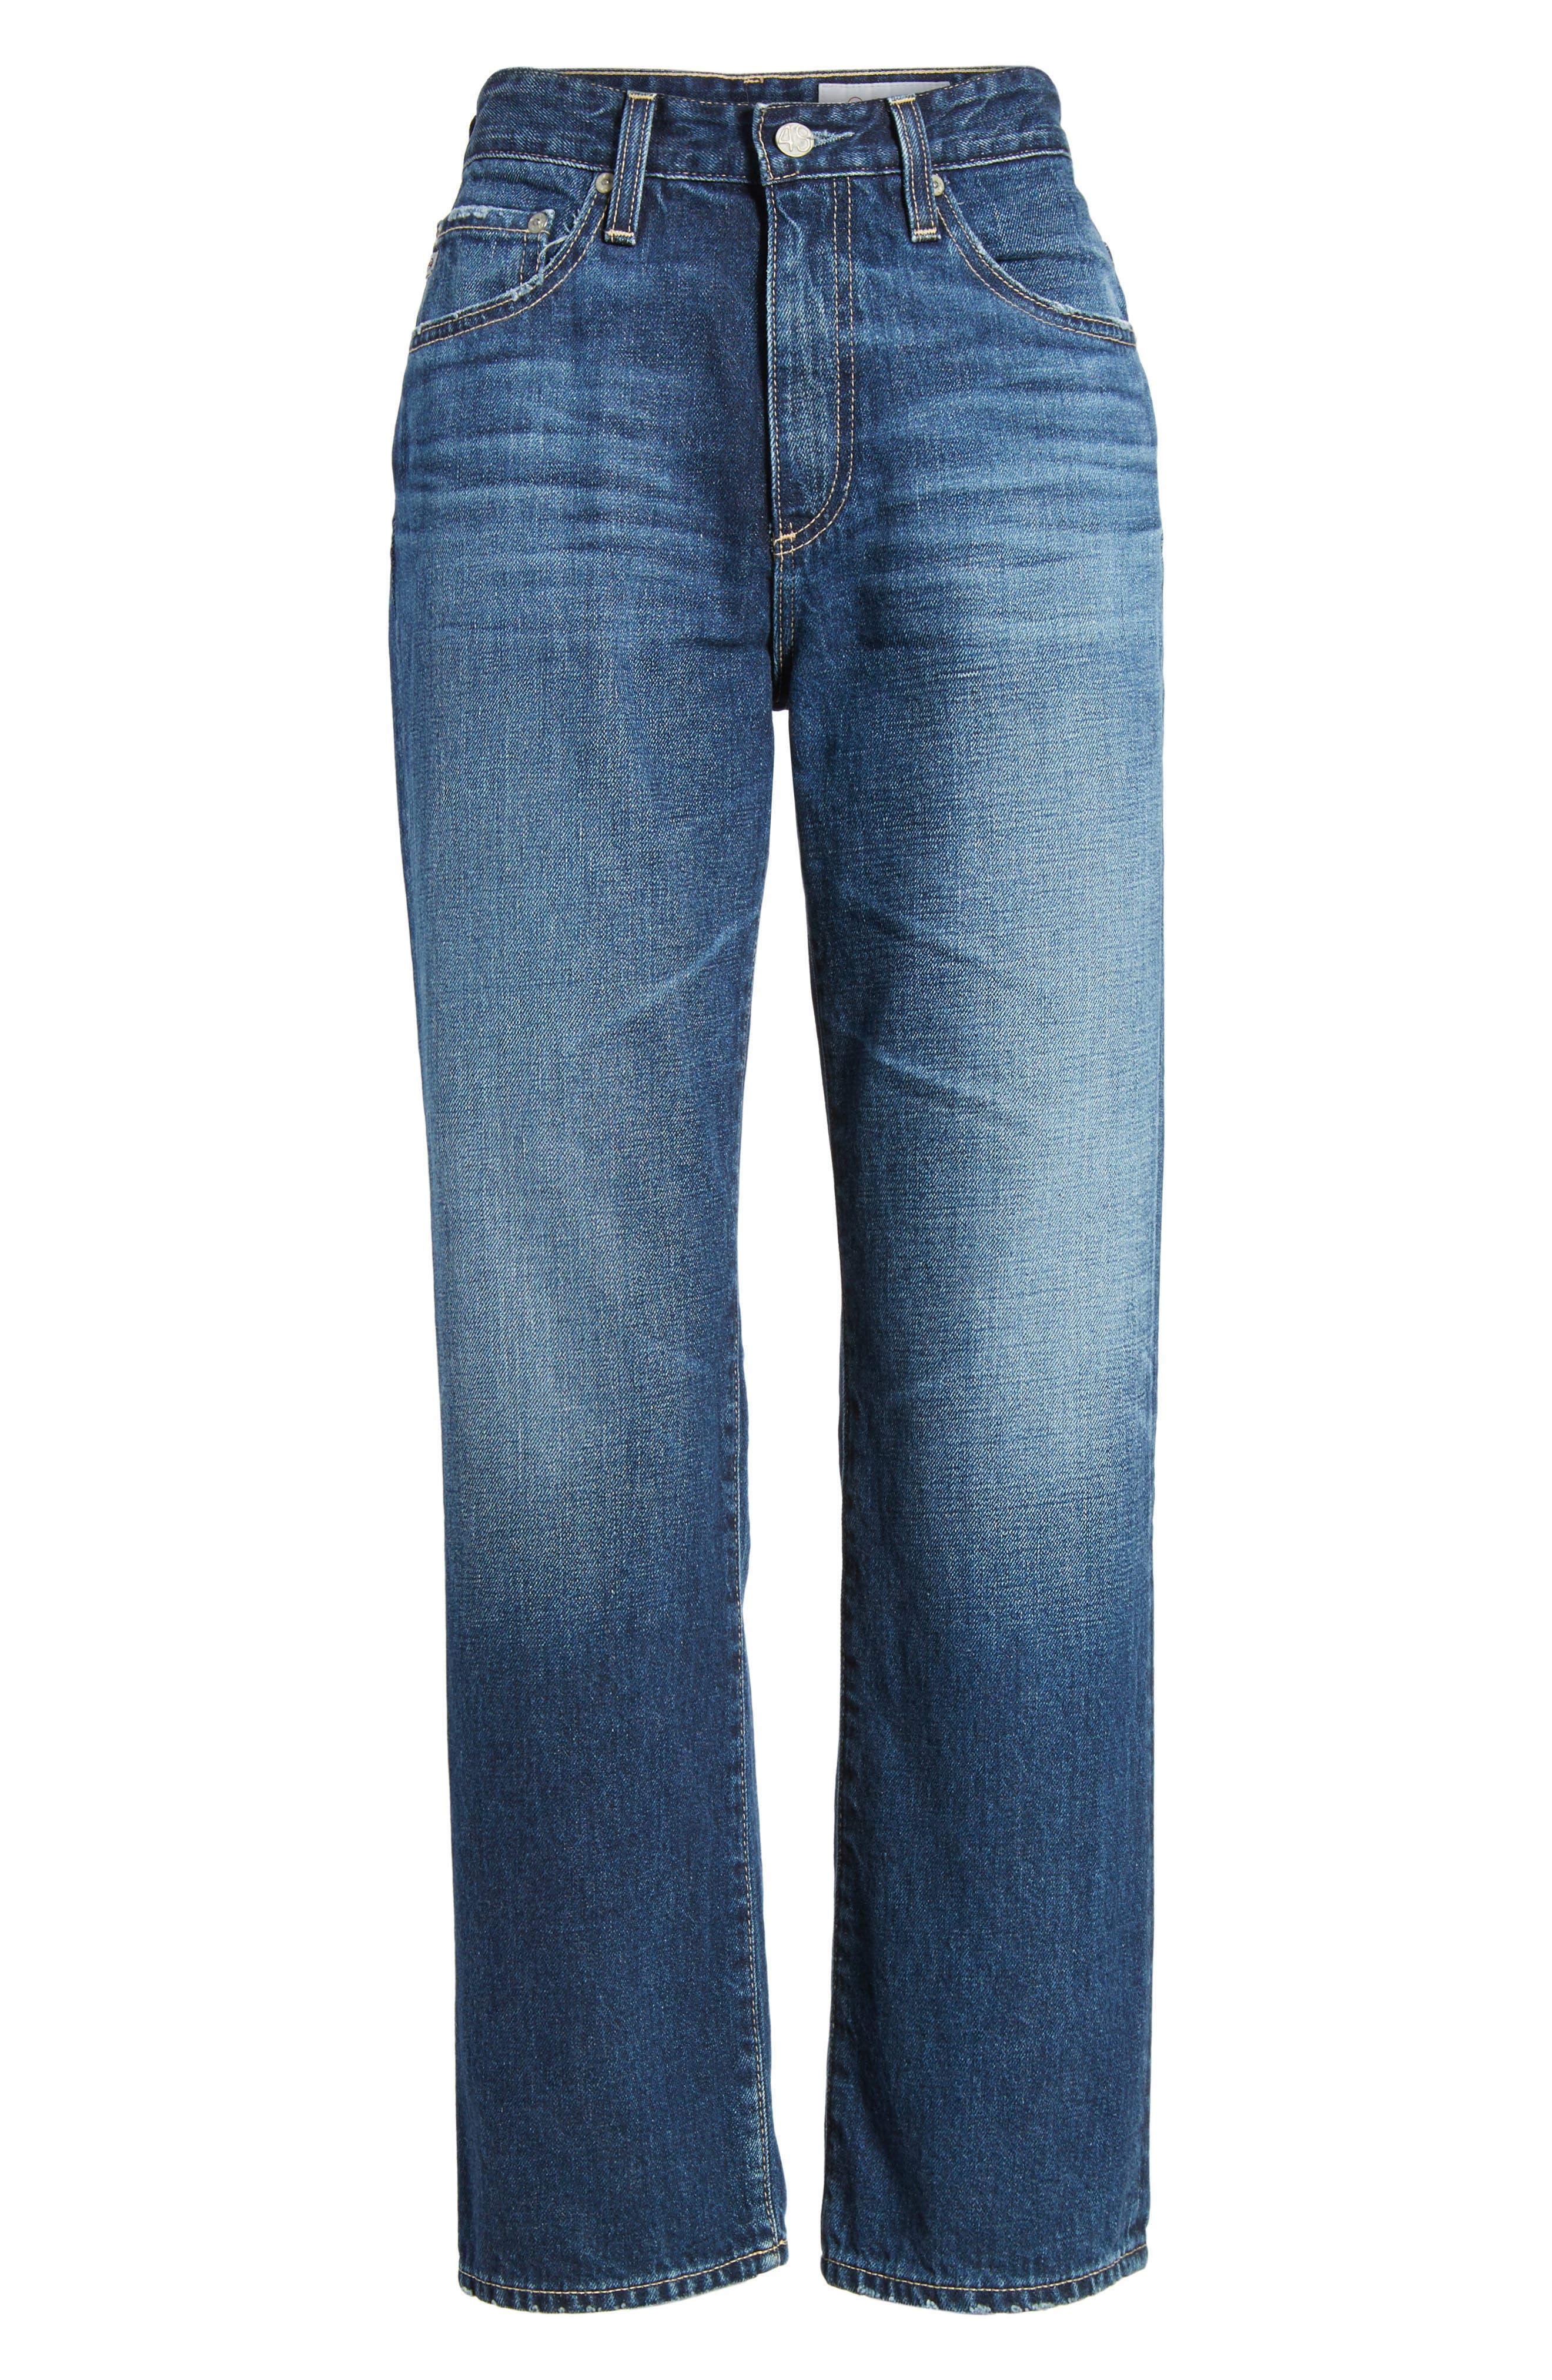 The Rhett Vintage High Waist Crop Jeans,                             Alternate thumbnail 8, color,                             11 Years Jubilee